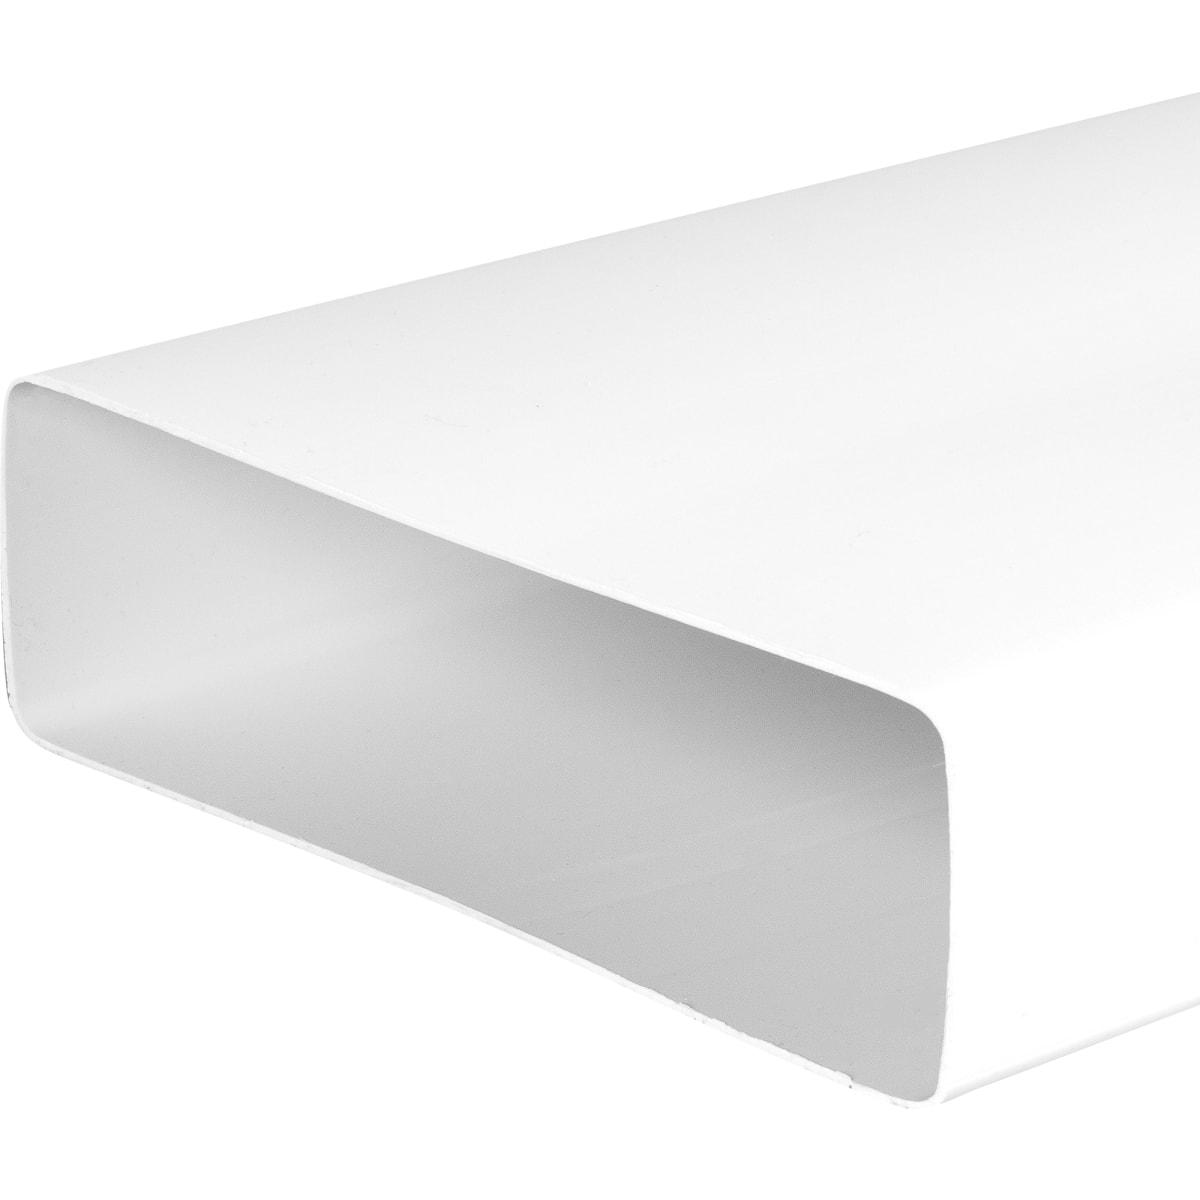 Канал плоский Equation, 55х110х500 мм